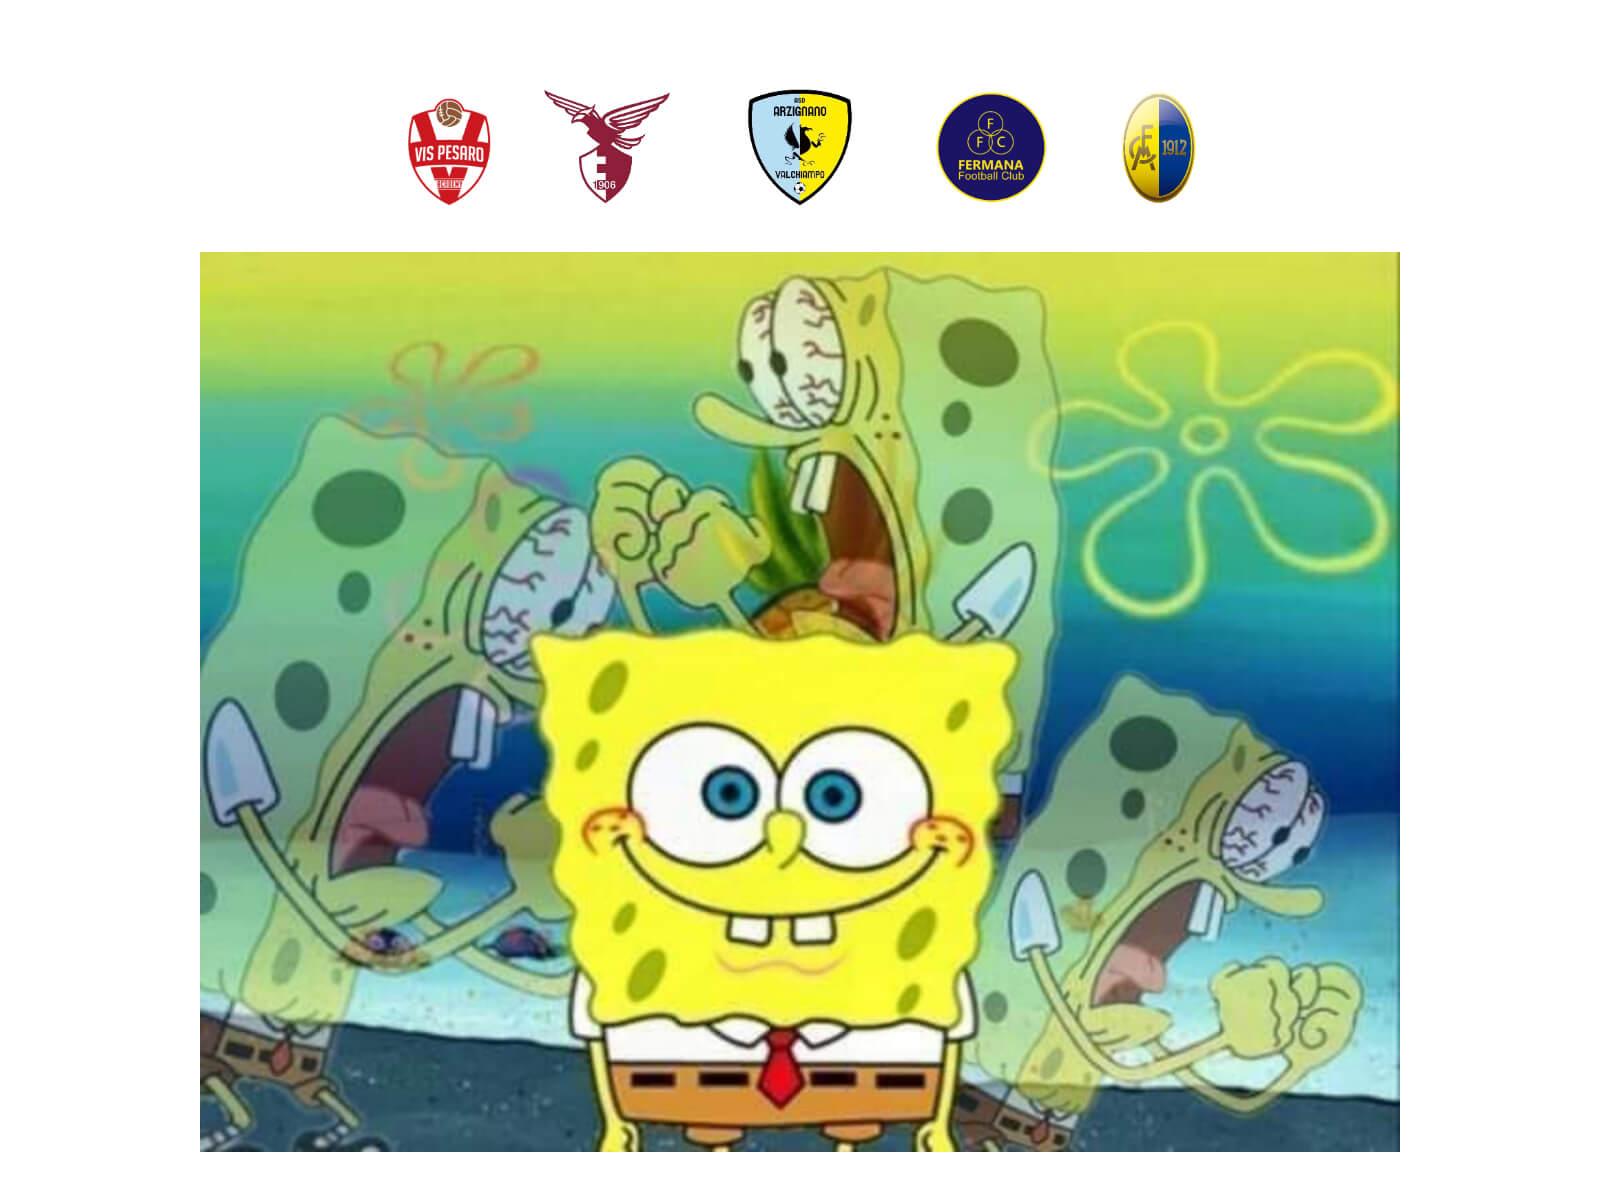 Vernecchie x Spongebob